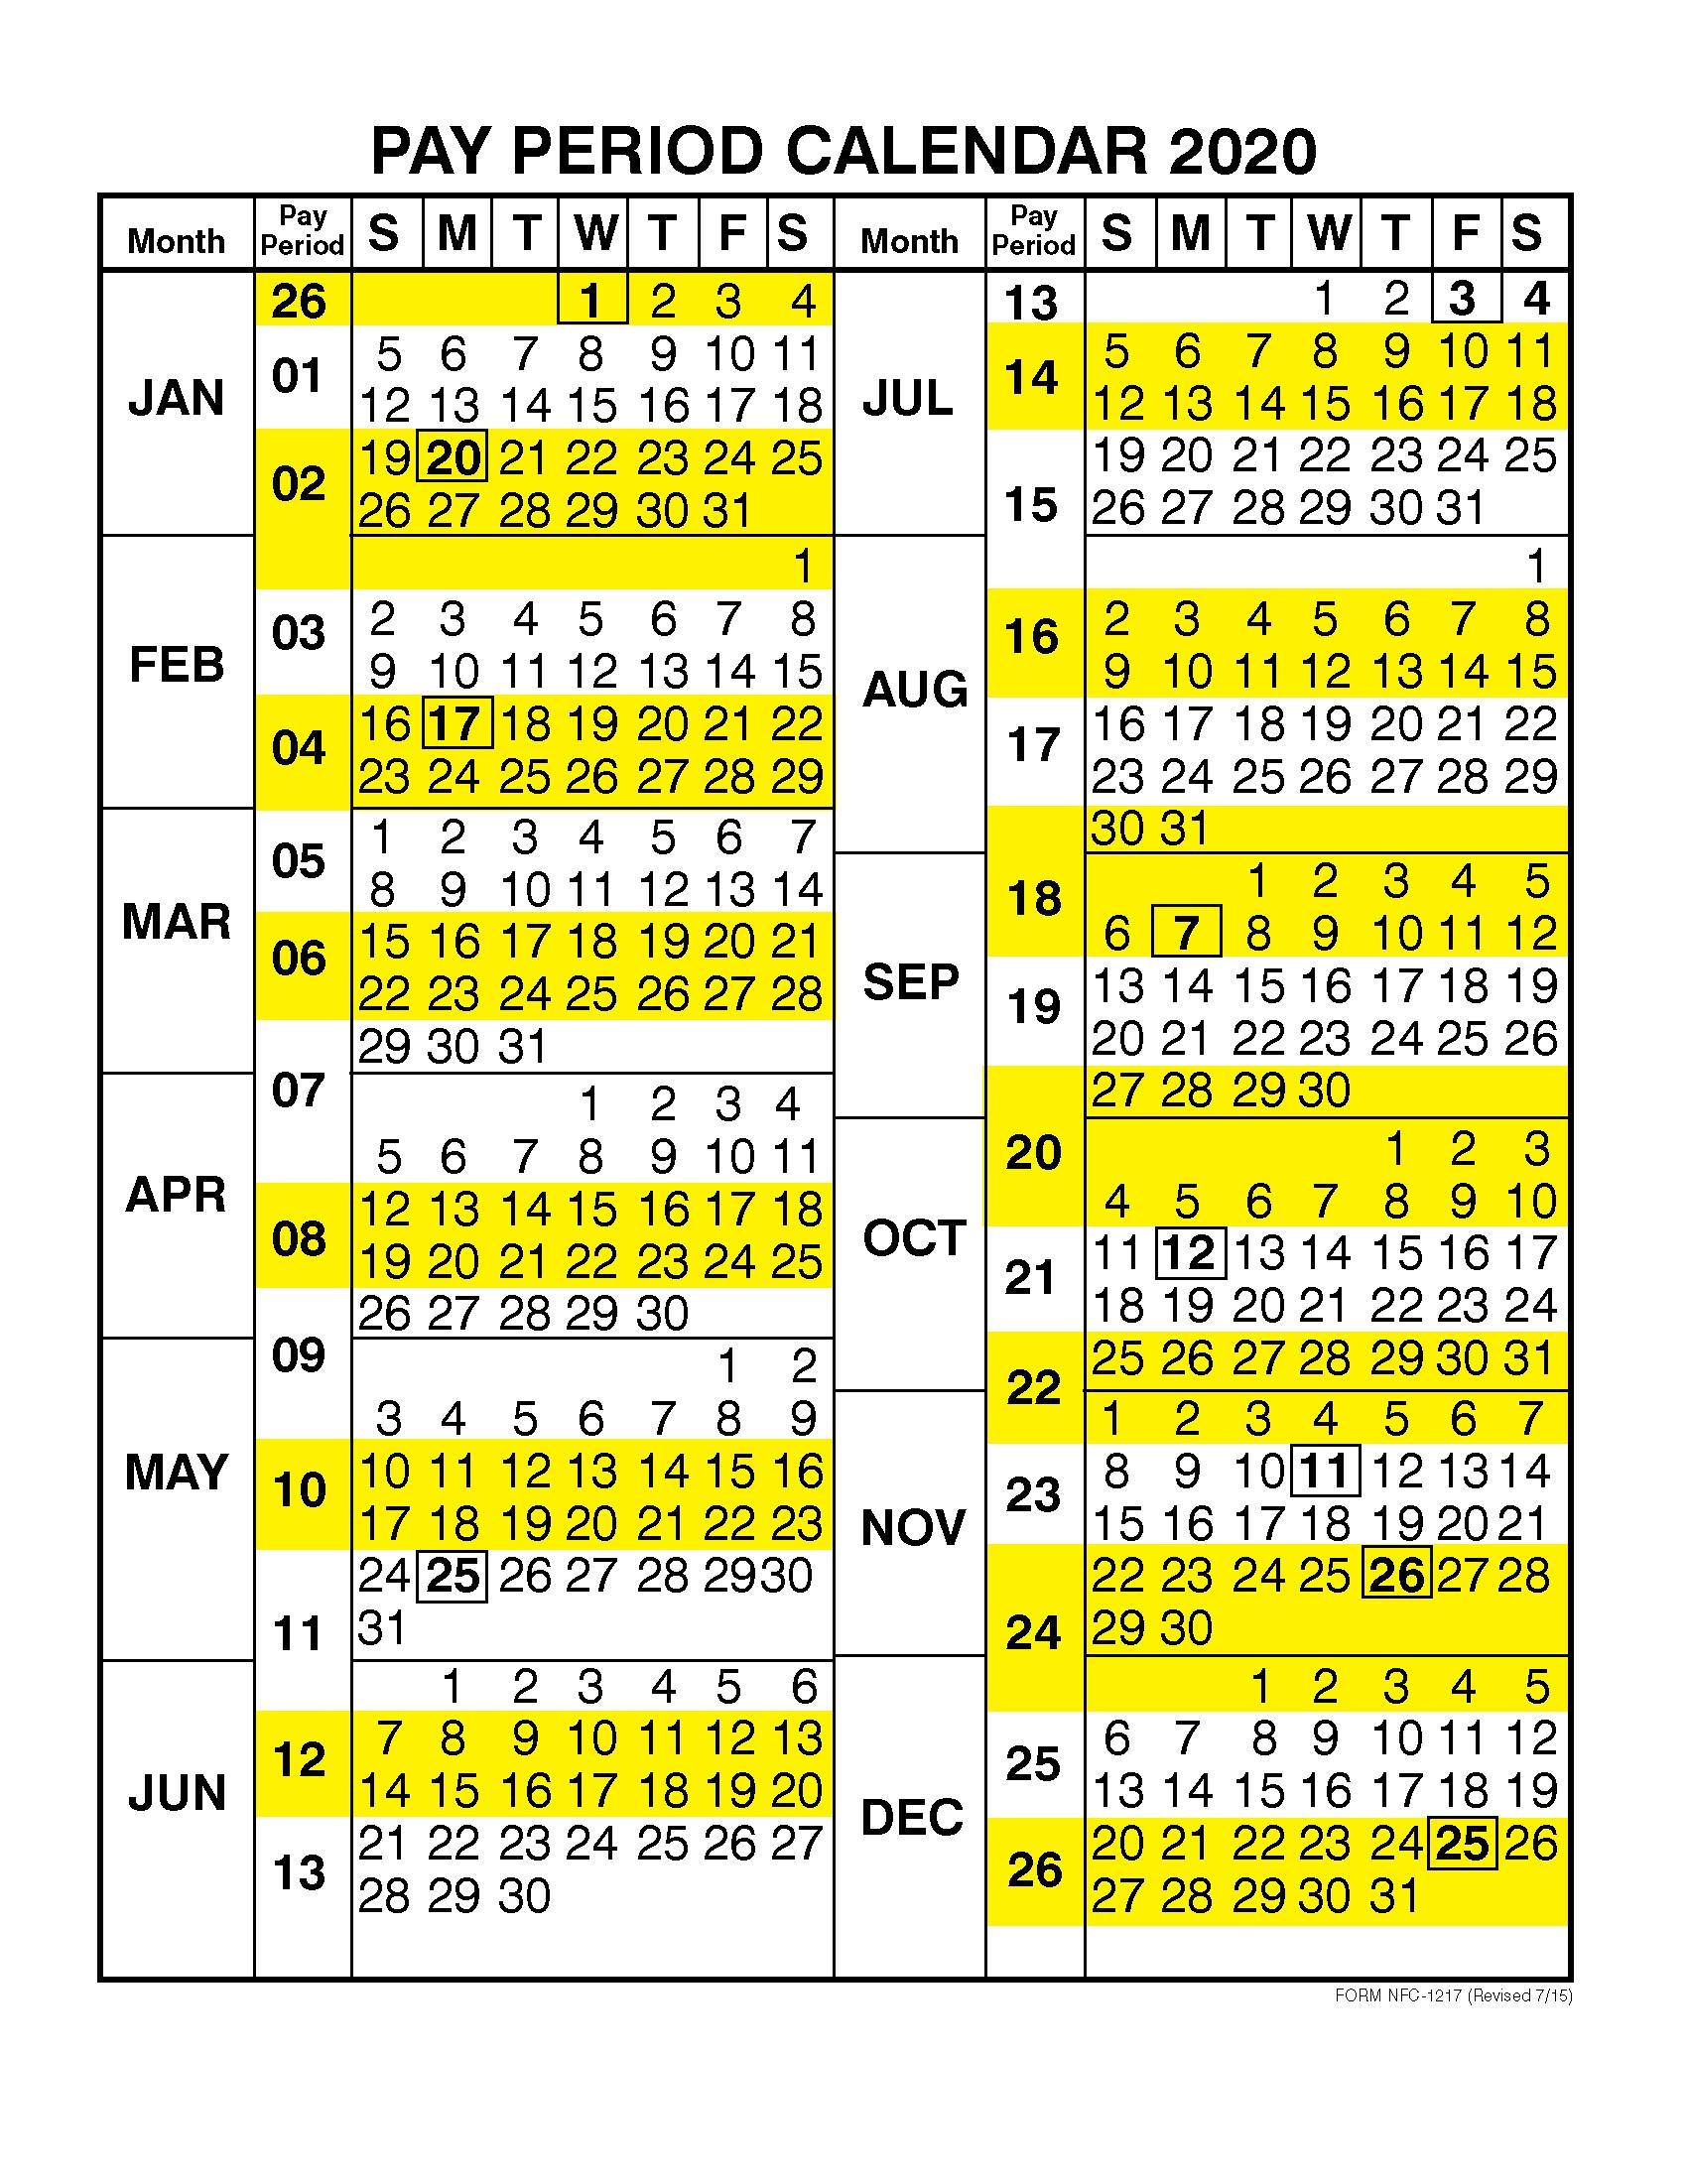 Ctu Payroll Calendar 2020 | 2021 Pay Periods Calendar with Federal Civilian Pay Periods 2020